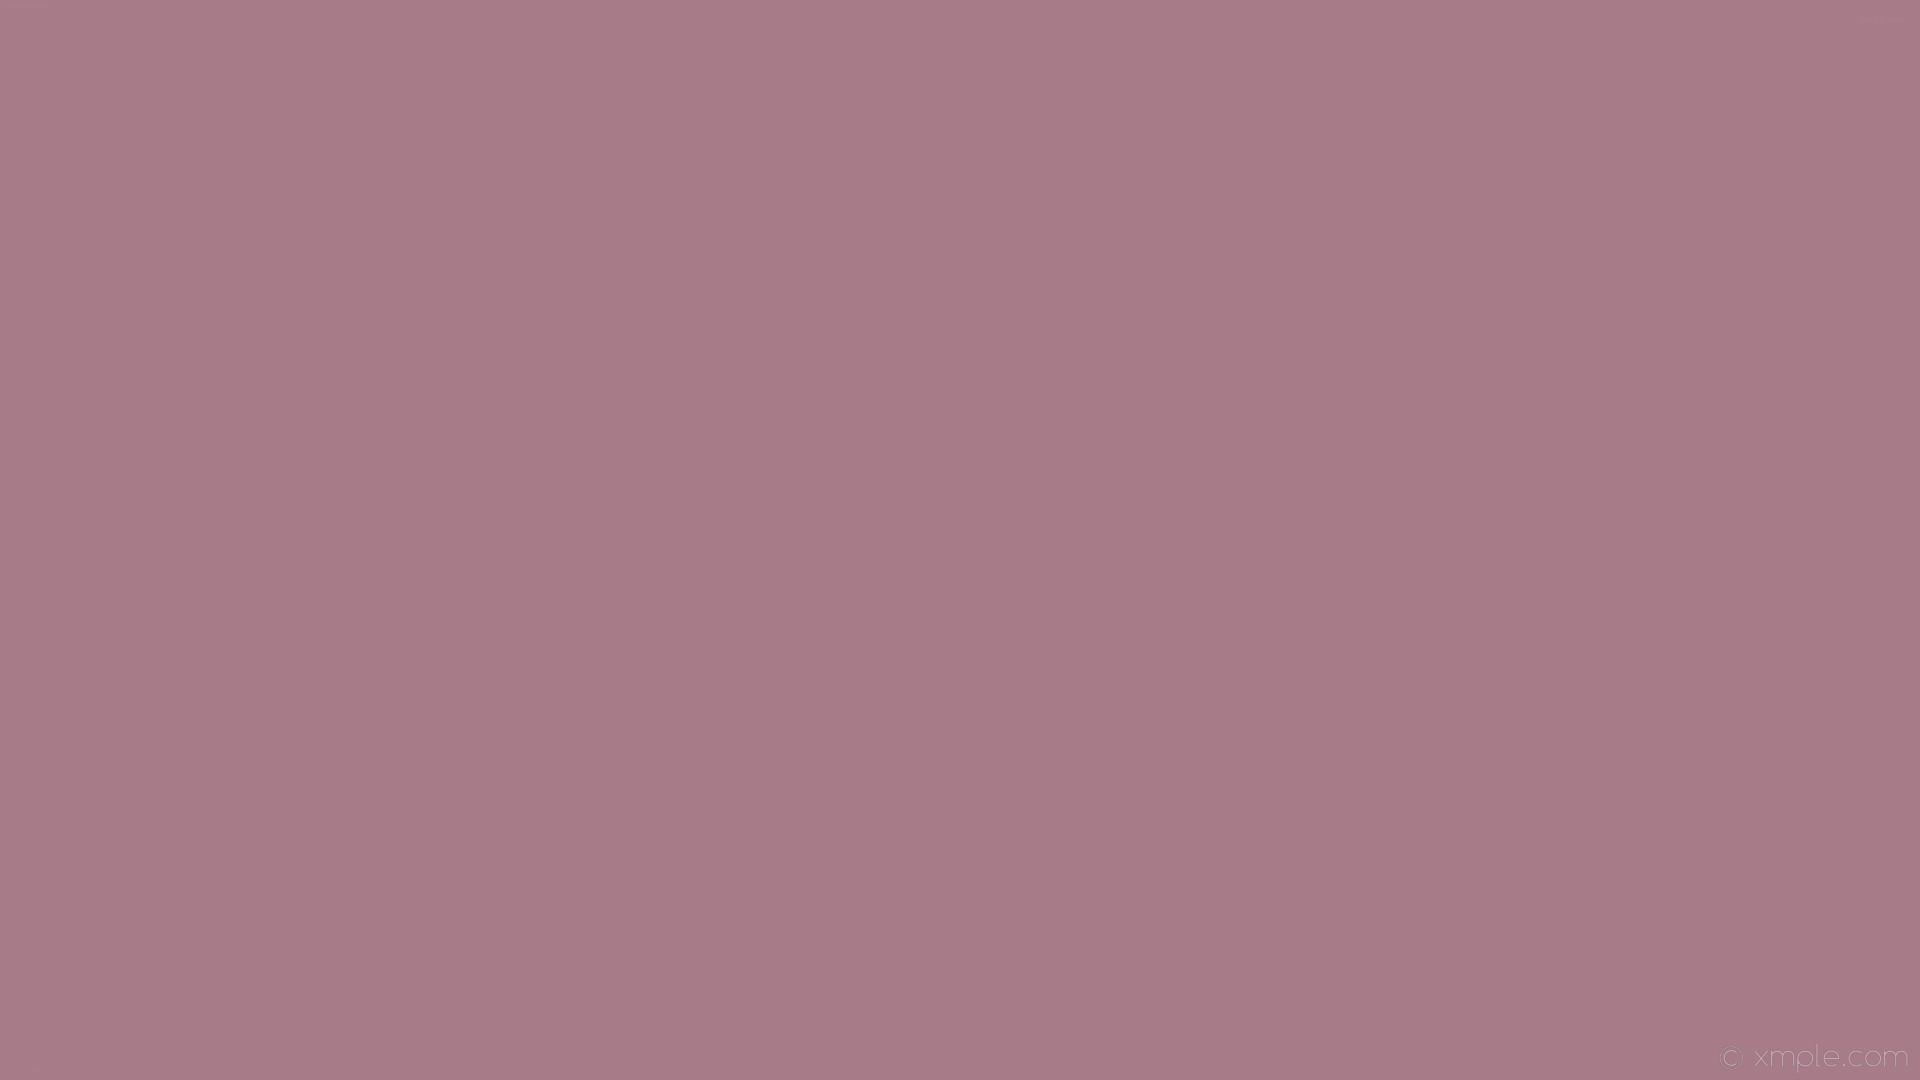 wallpaper one colour solid color plain single pink #a87b89